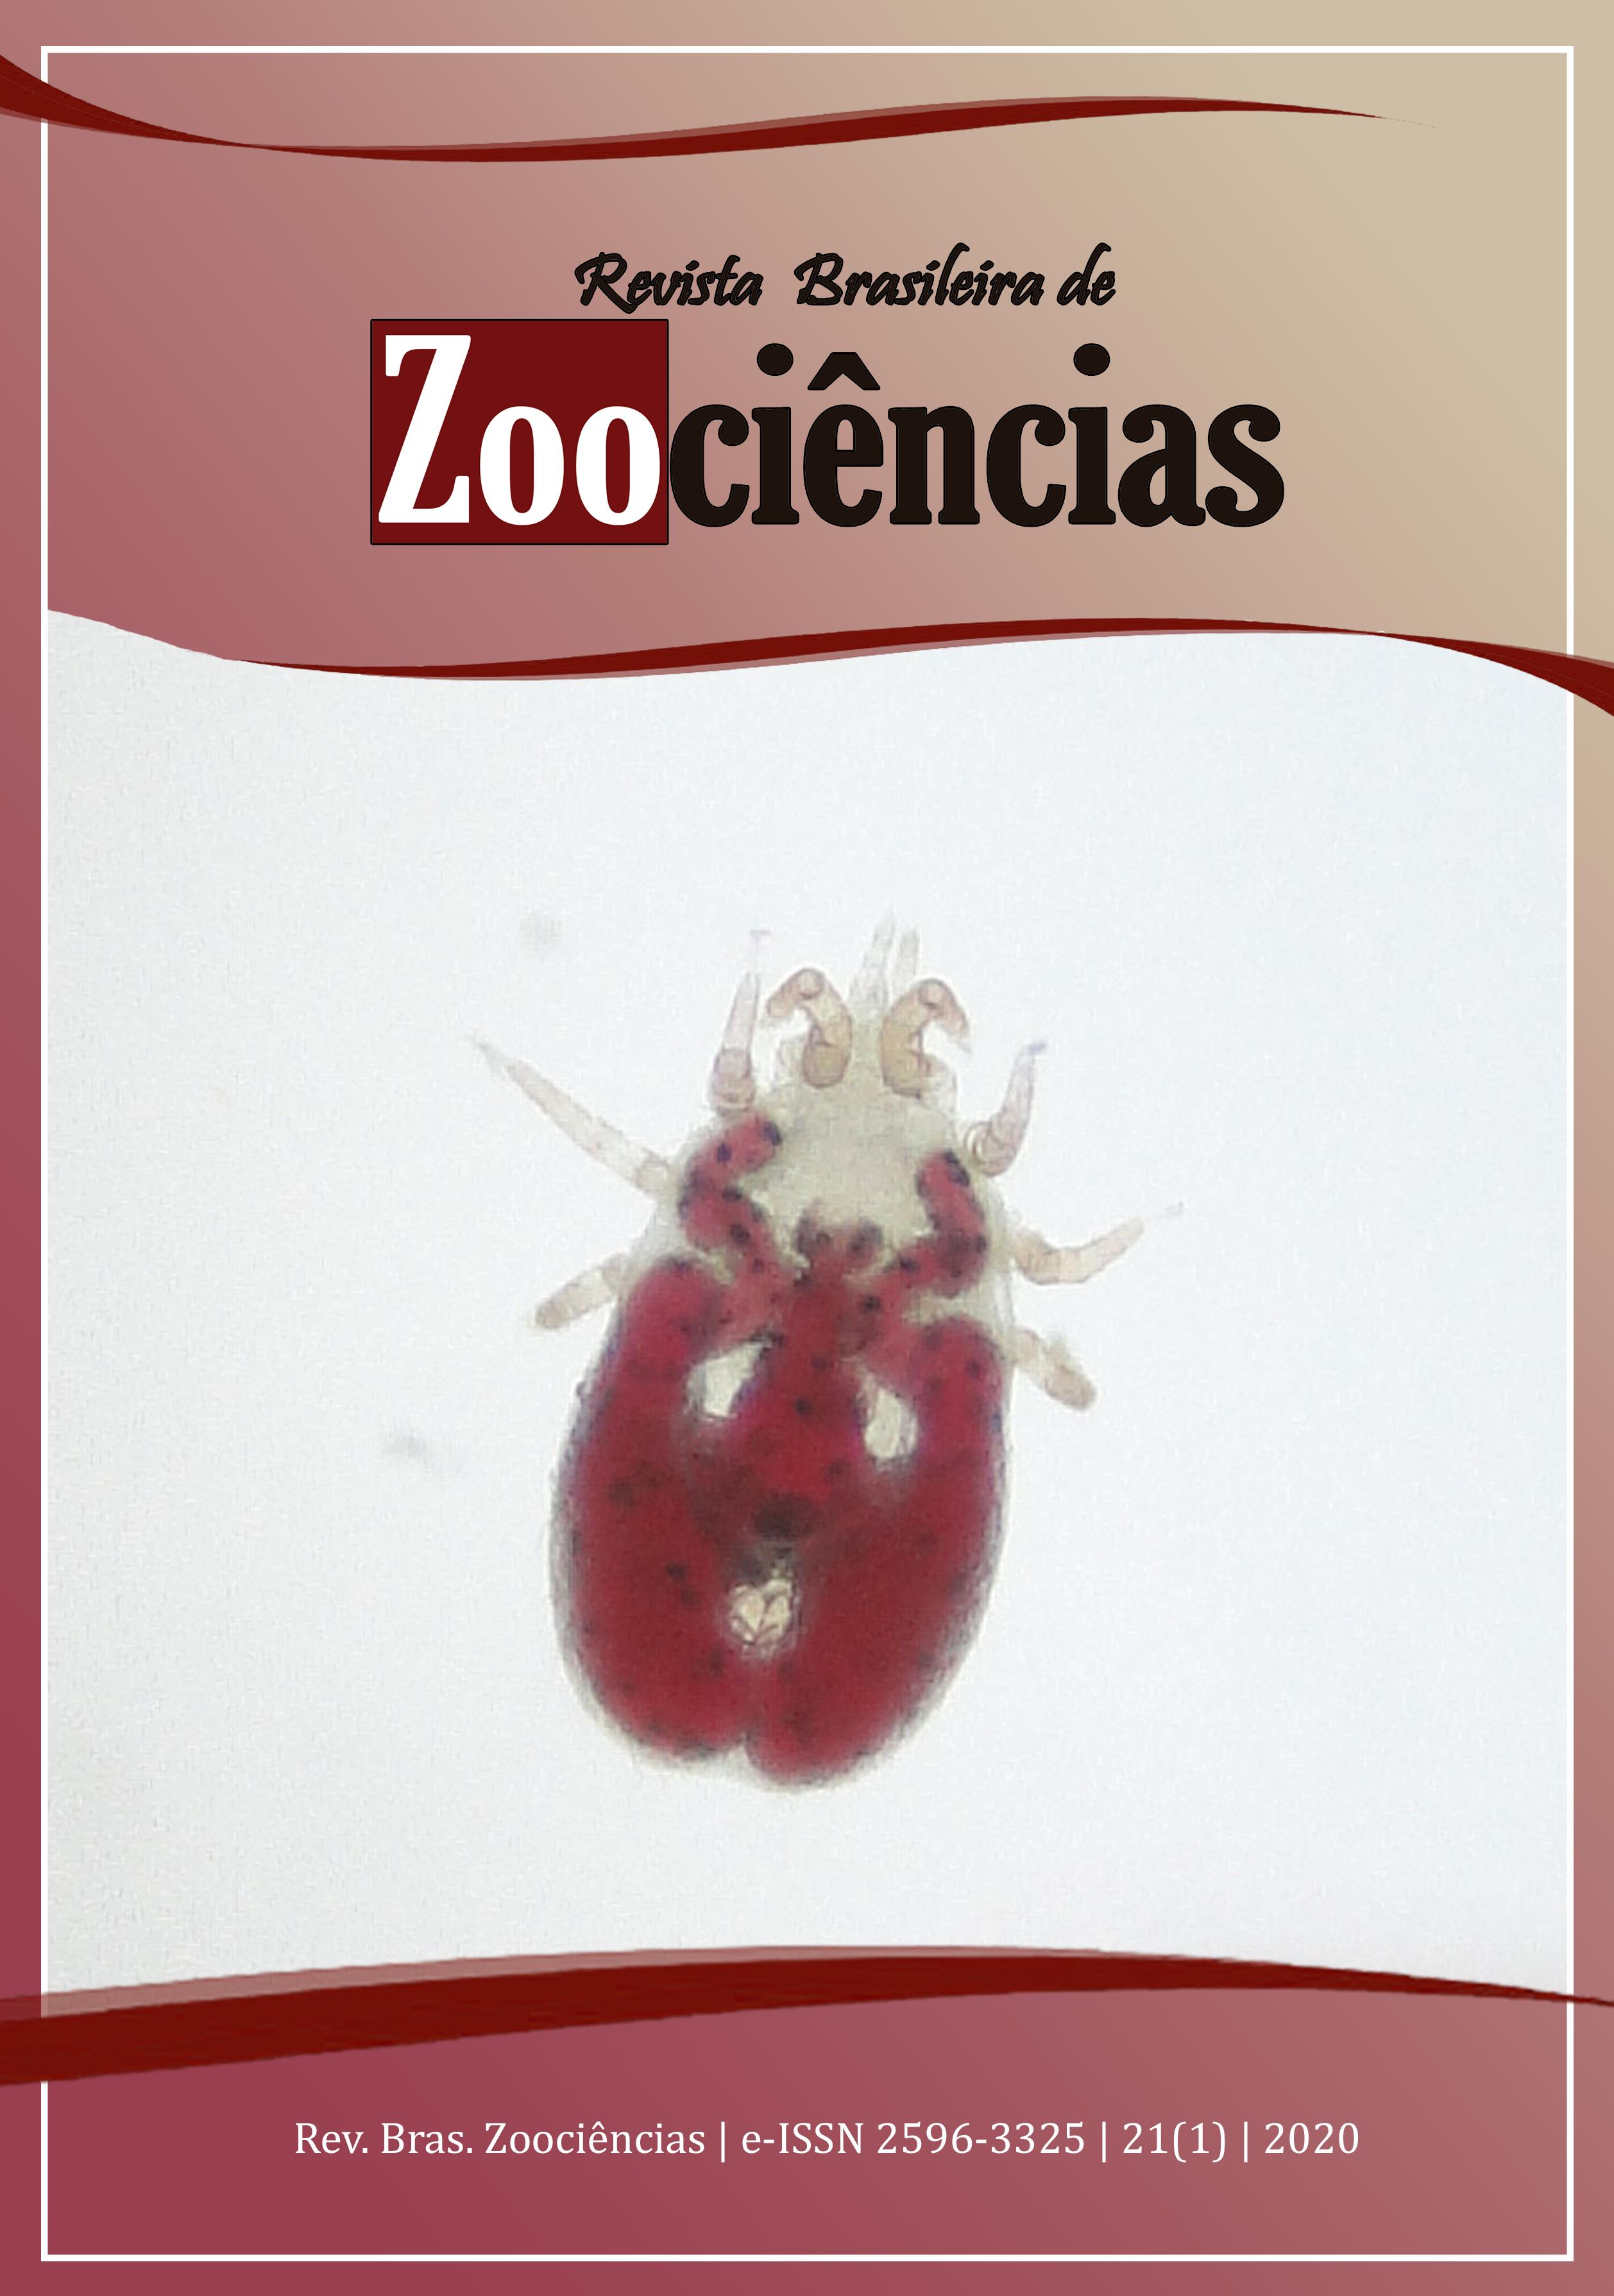 Espécime de Pellonyssus reedi (Zump & Patterson, 1952), autoria de Paulo Roberto Silveira dos Santos